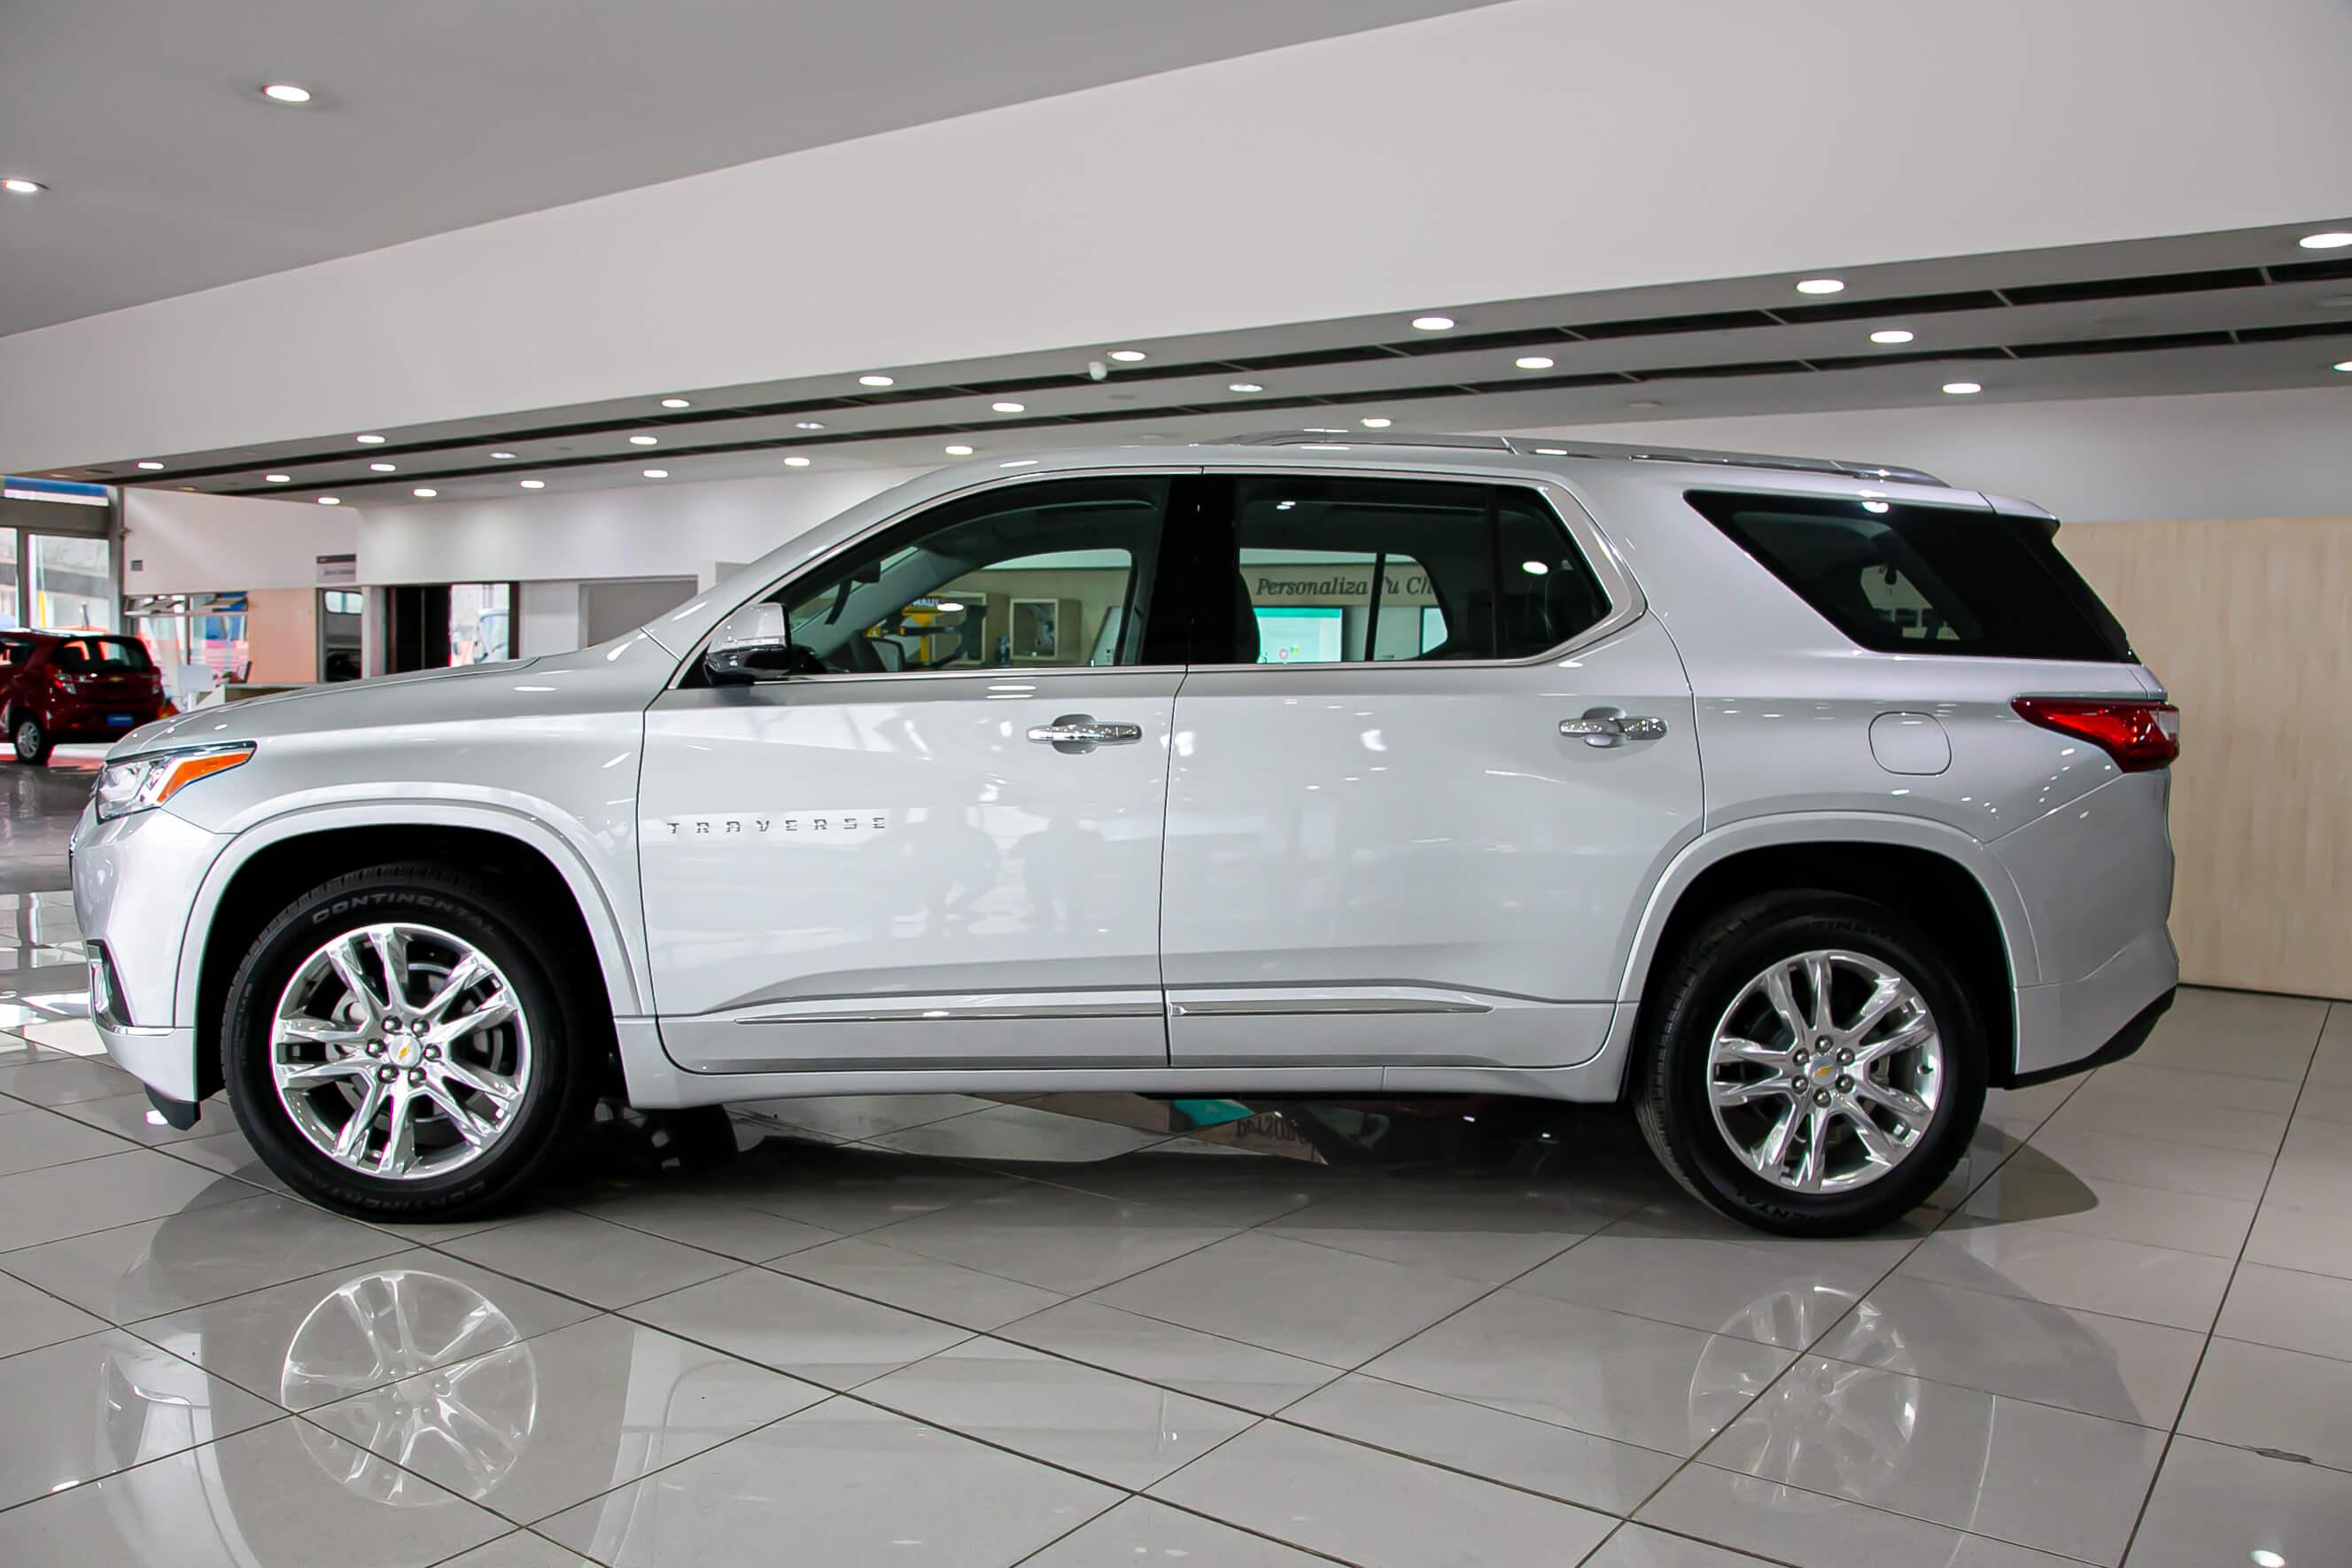 2.Camioneta-Chevrolet-Traverse-Autolarte.jpg